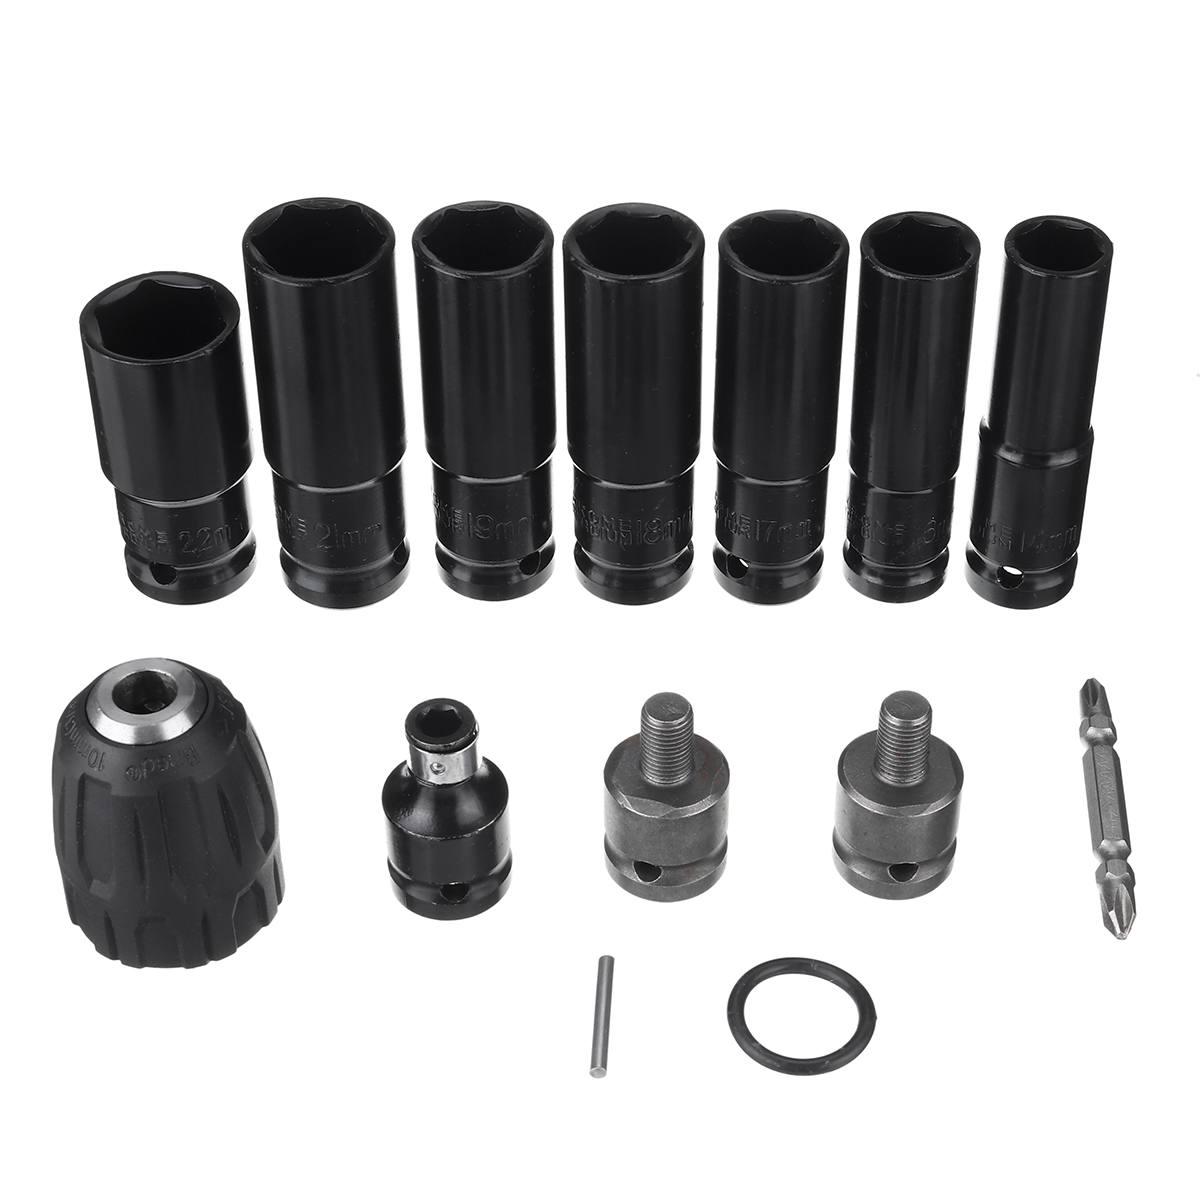 Adaptador de Chave Elétrica para Chave de Impacto 14 em 1 Luva Chave Elétrica Hex Soquete Cabeça Conjunto Kit Broca 7 14-22mm